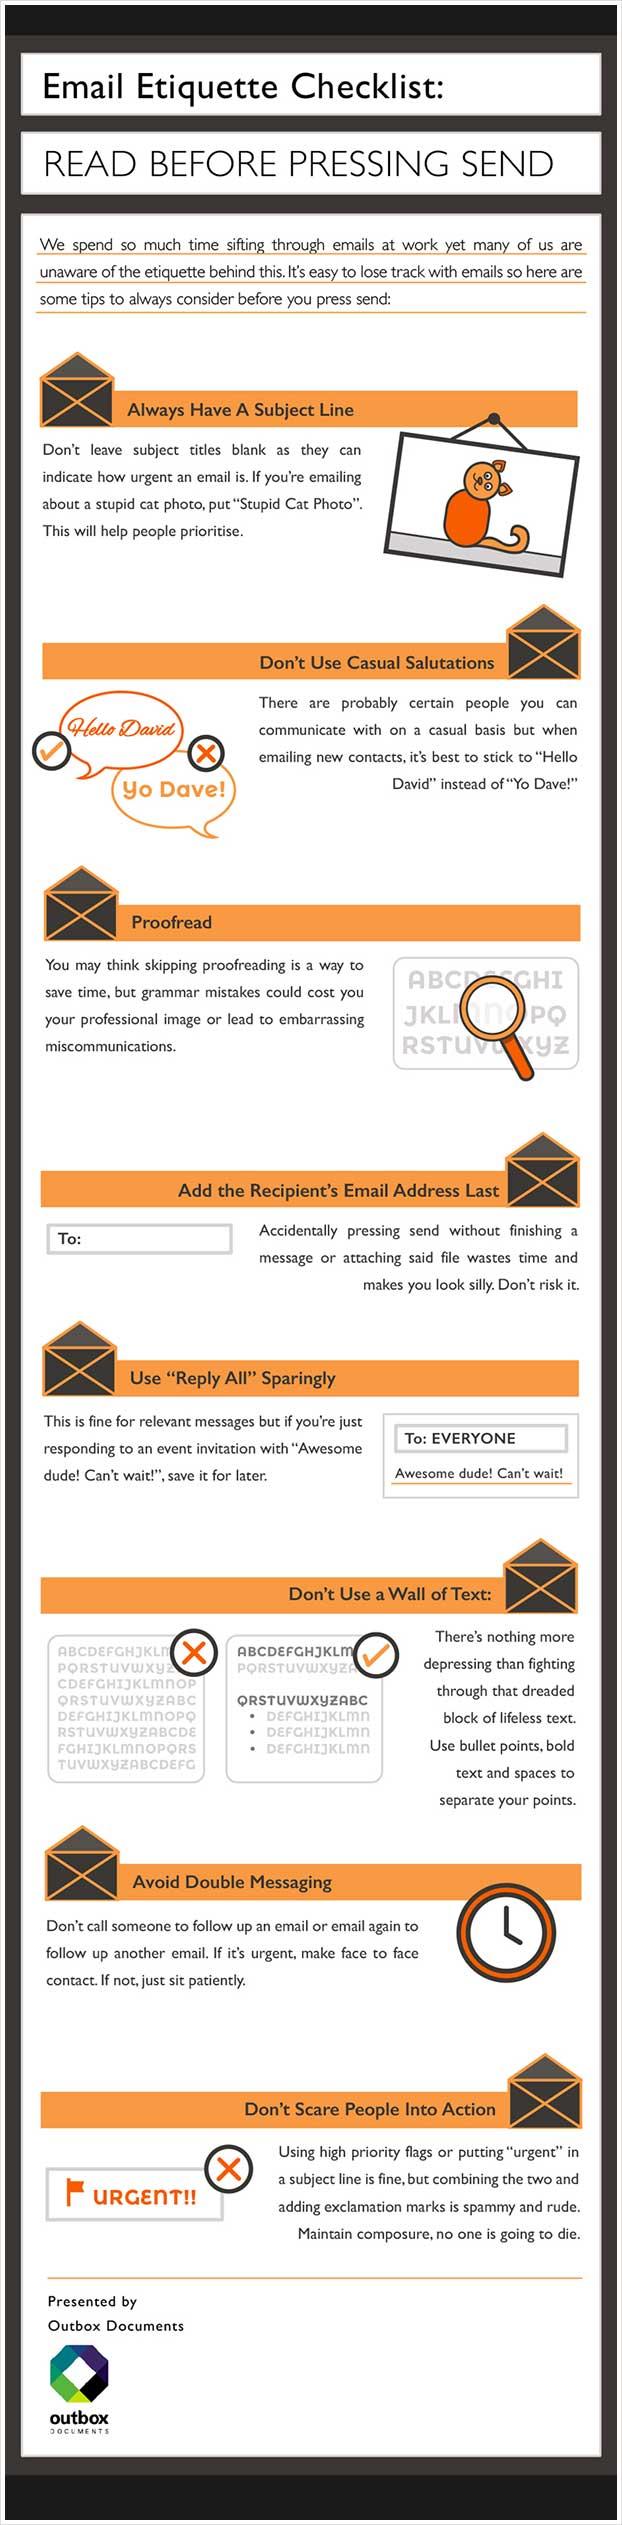 Email Etiquette Checklist Read before pressing send